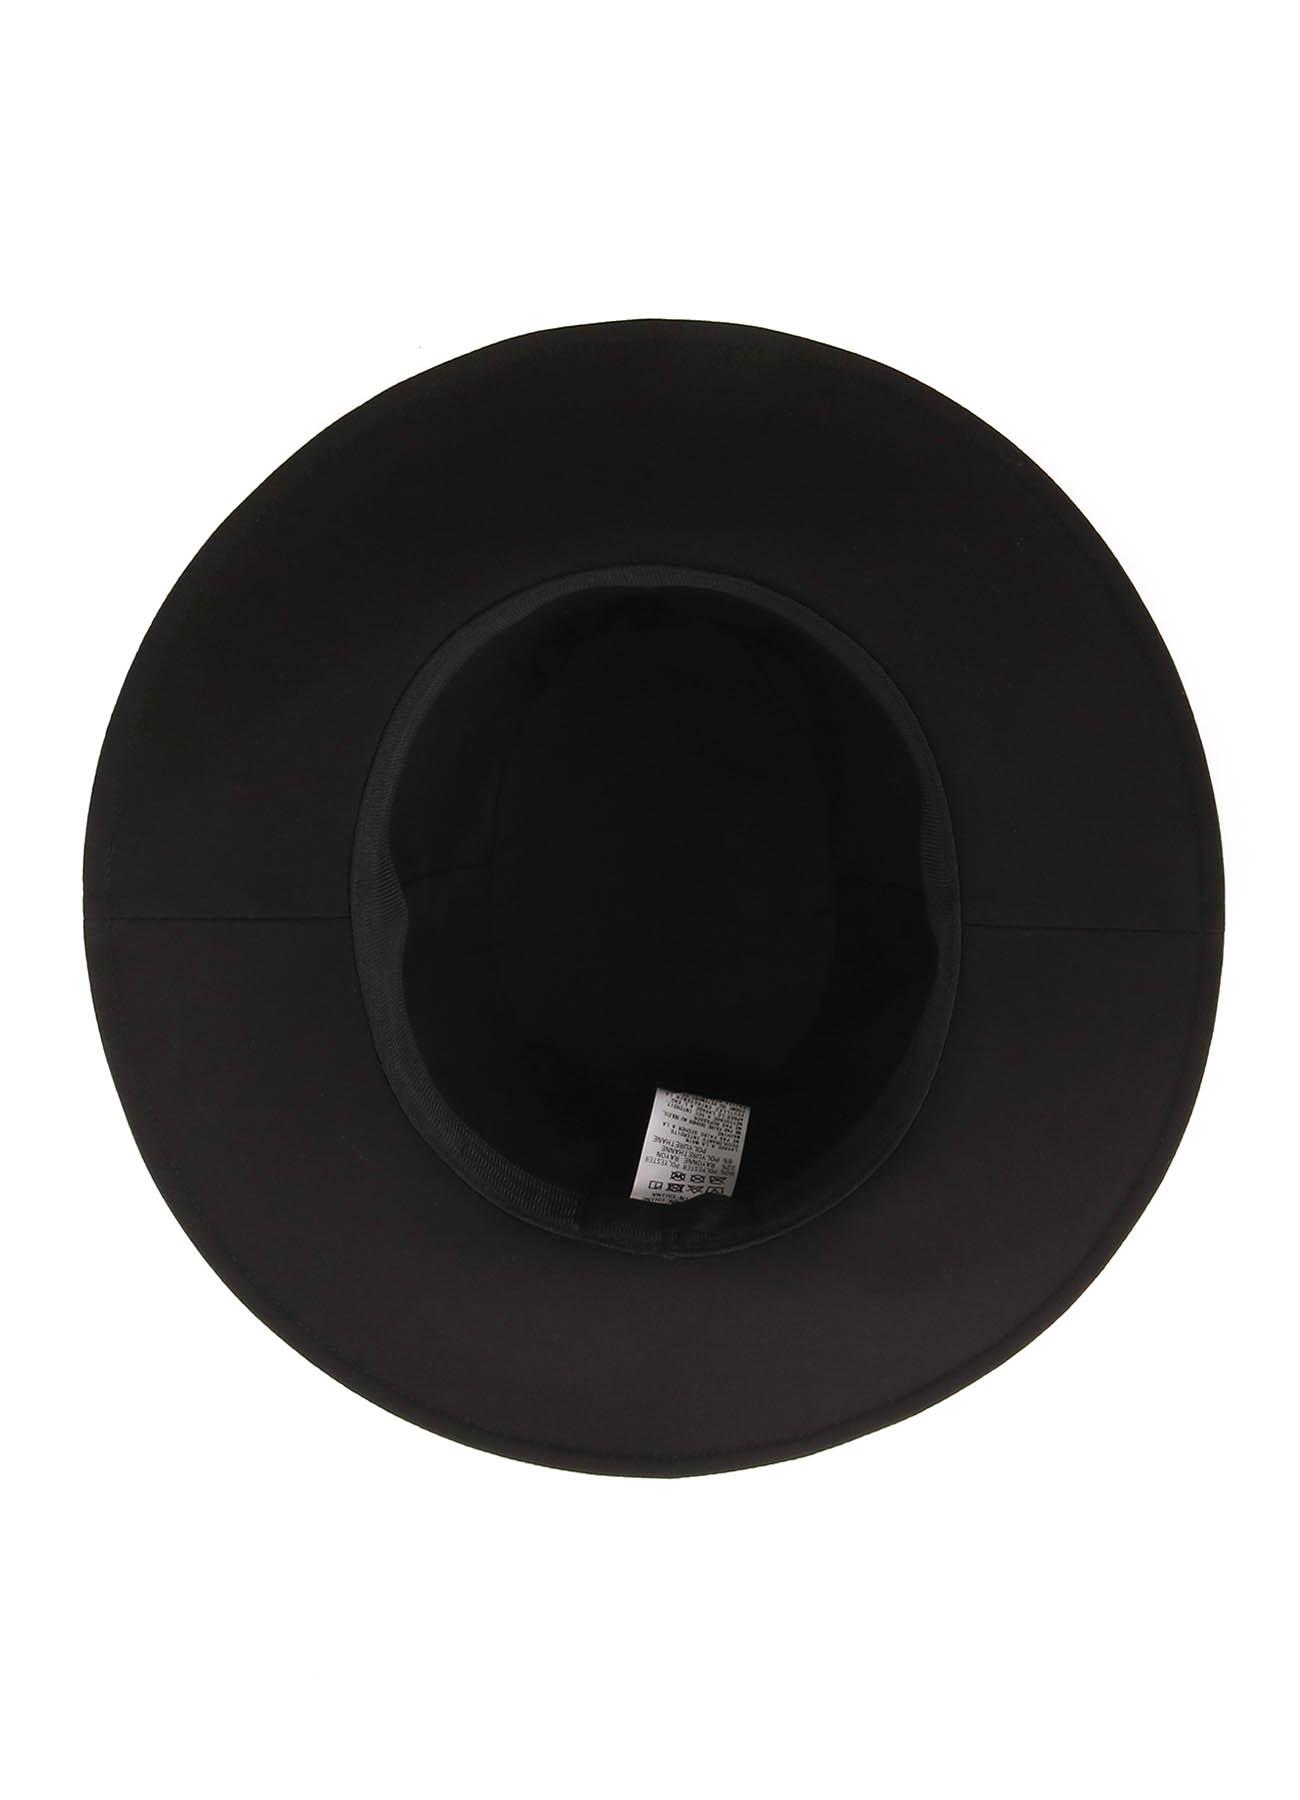 Pe/Rayon Gabardine Stretch Splash Paint Processing  Long Brim Hat